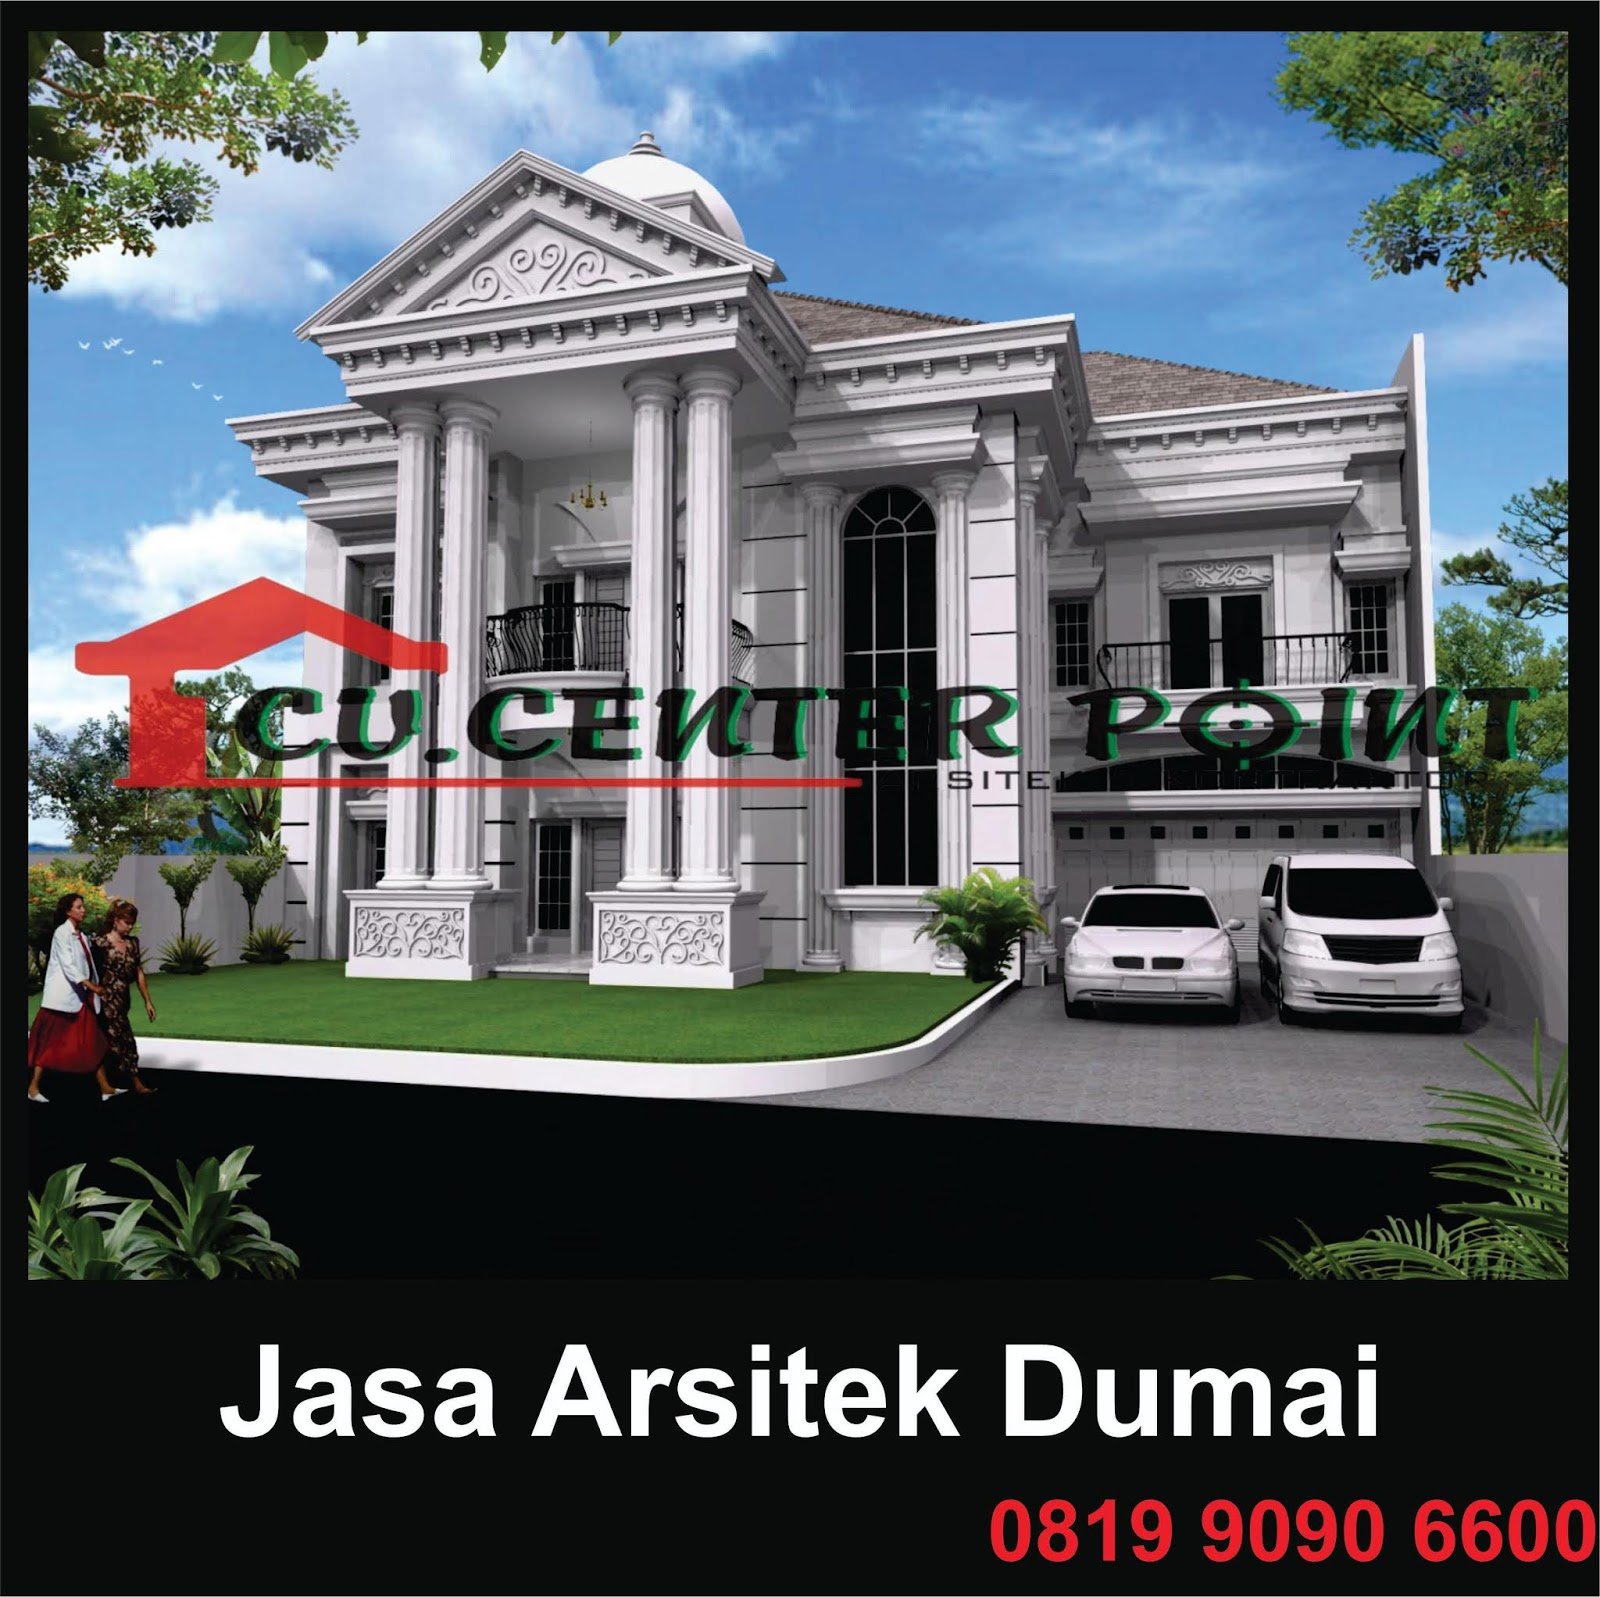 Jasa Arsitek Murah Dumai Jasa Desain Rumah Dumai